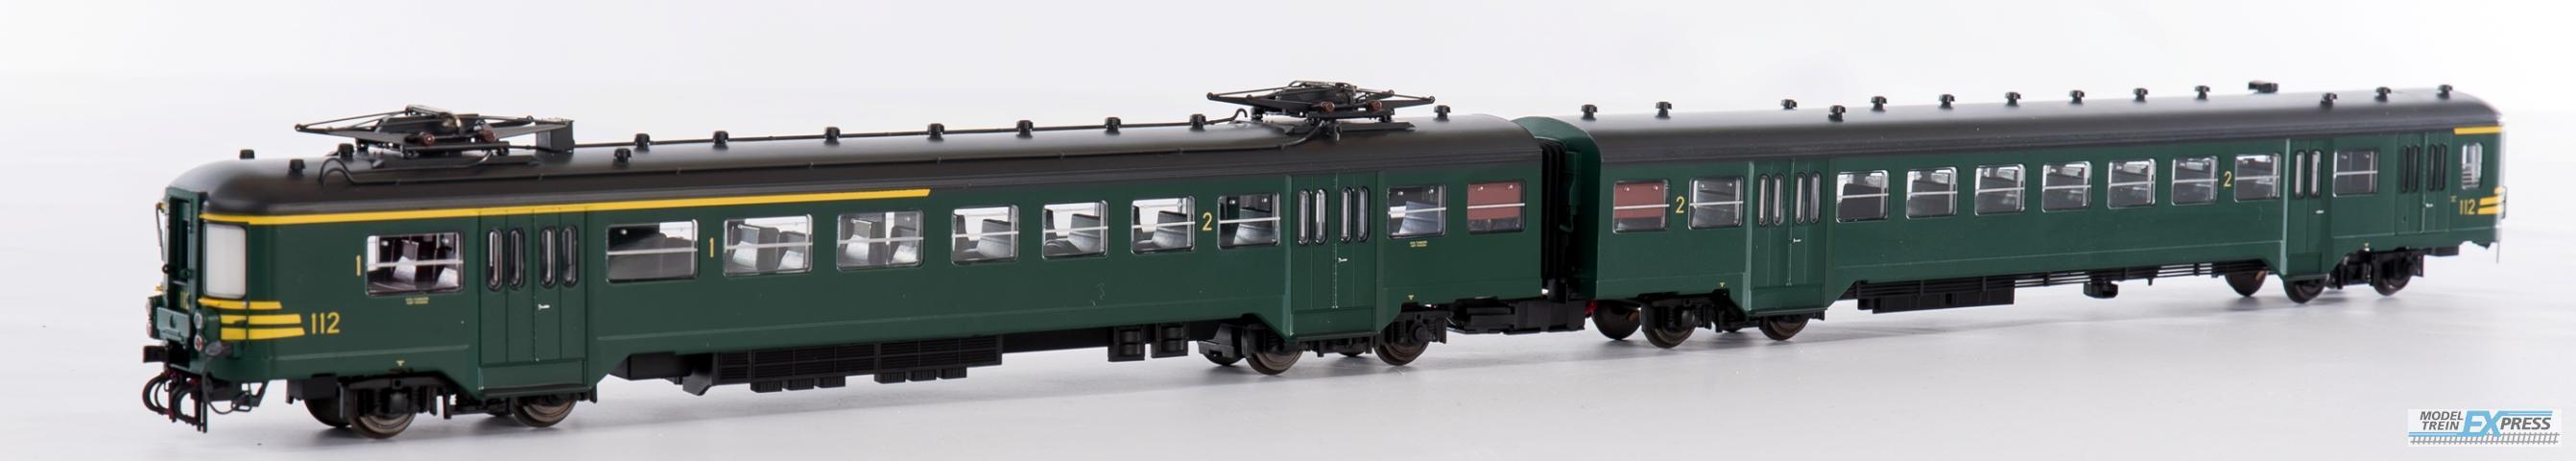 B-Models 7002.02L